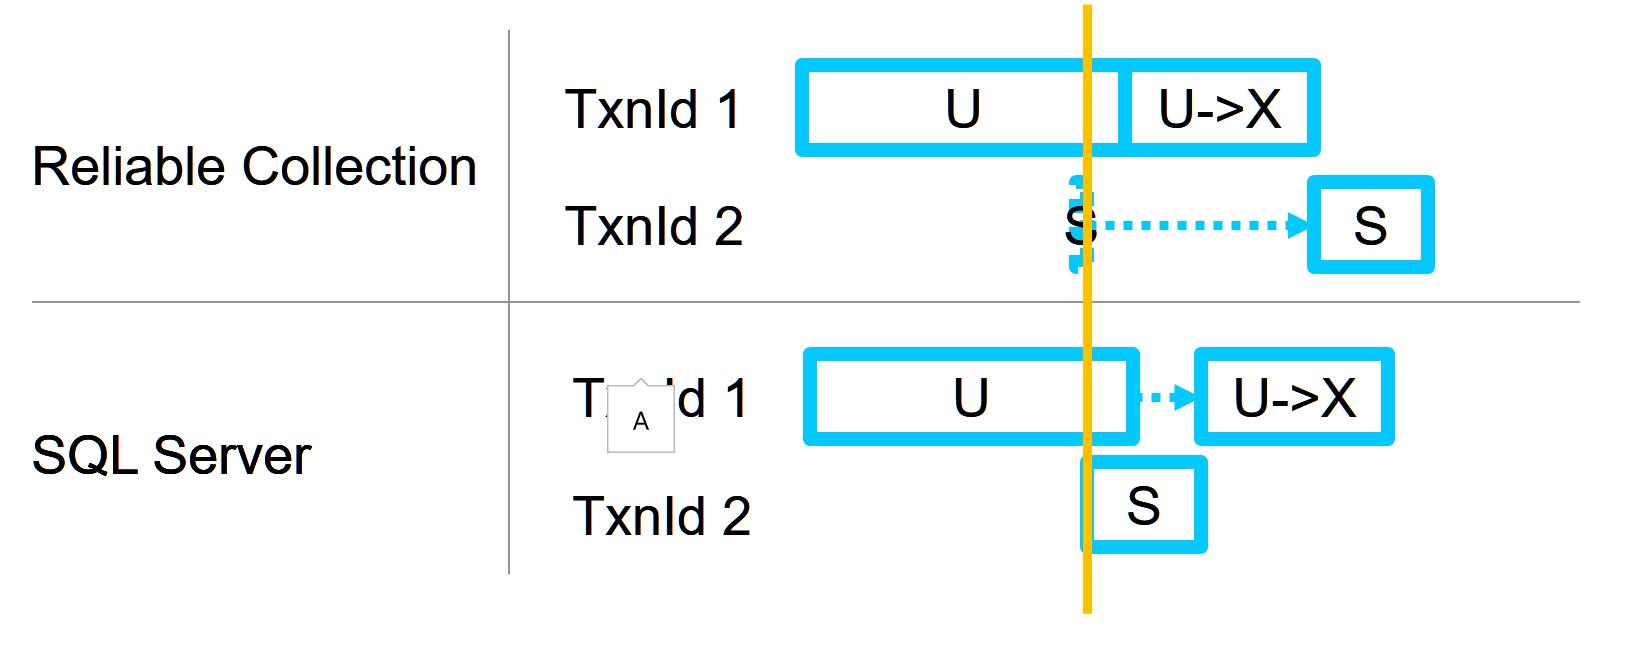 tnx and lock